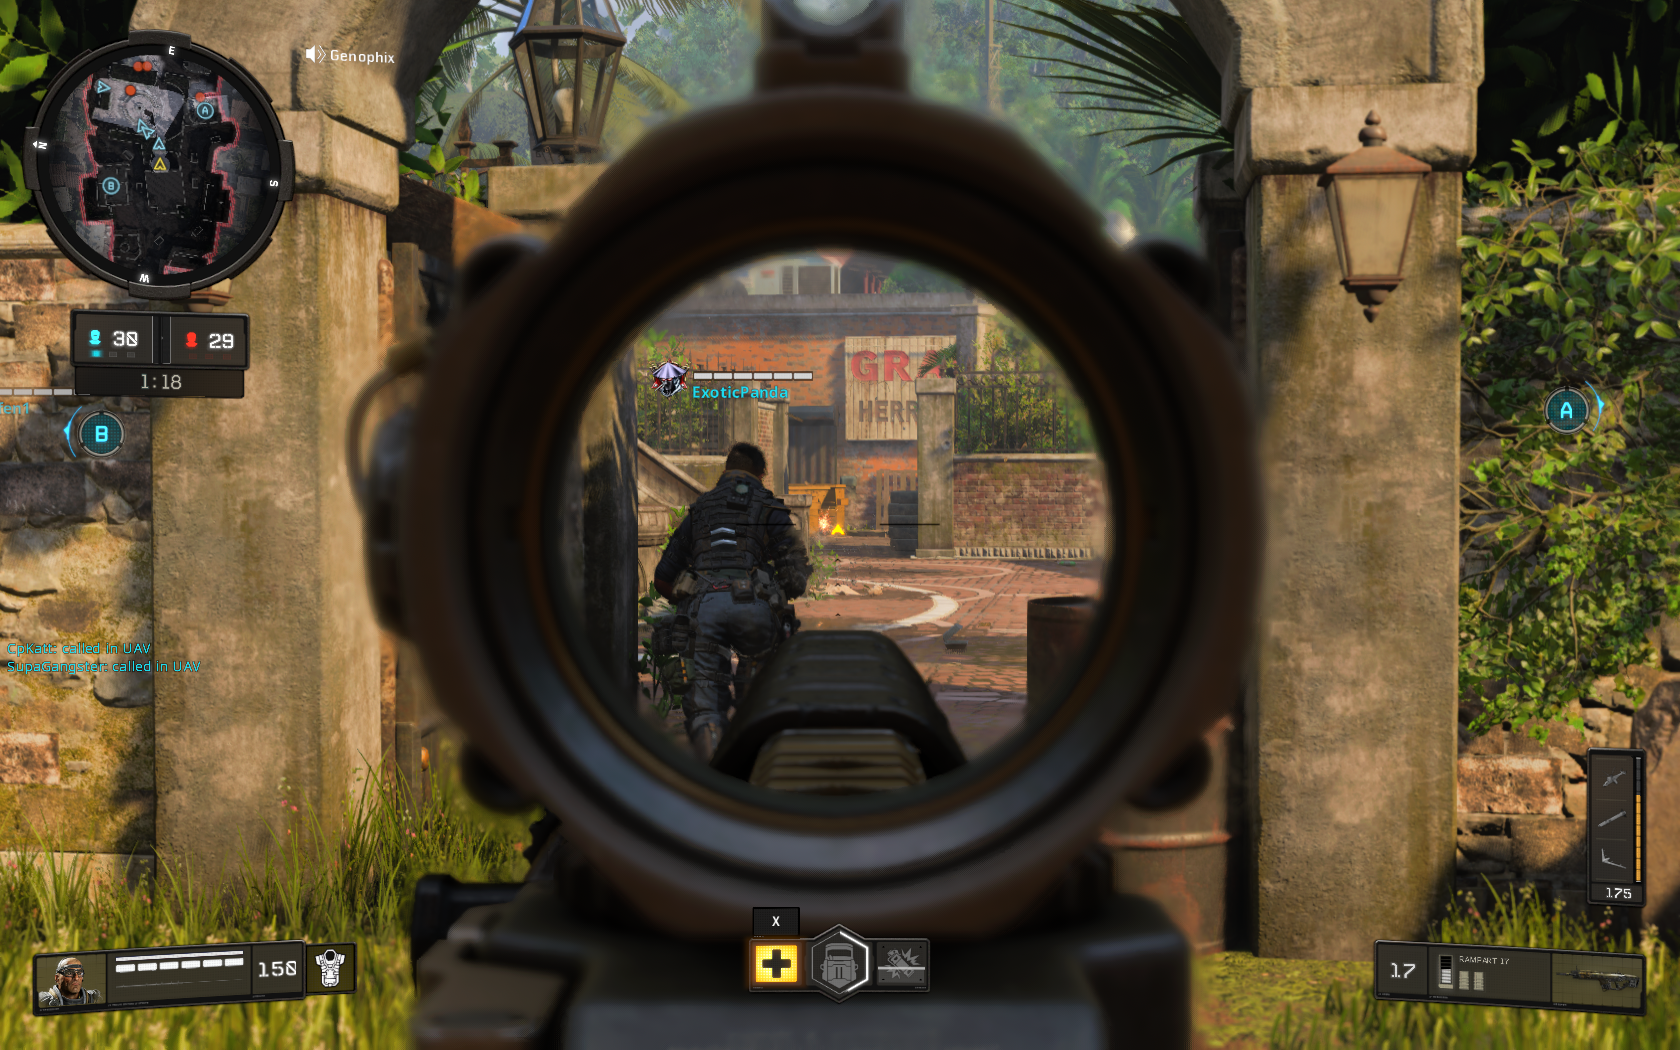 Call of Duty  Black Ops 4 Screenshot 2018.10.28 - 20.41.03.49.png